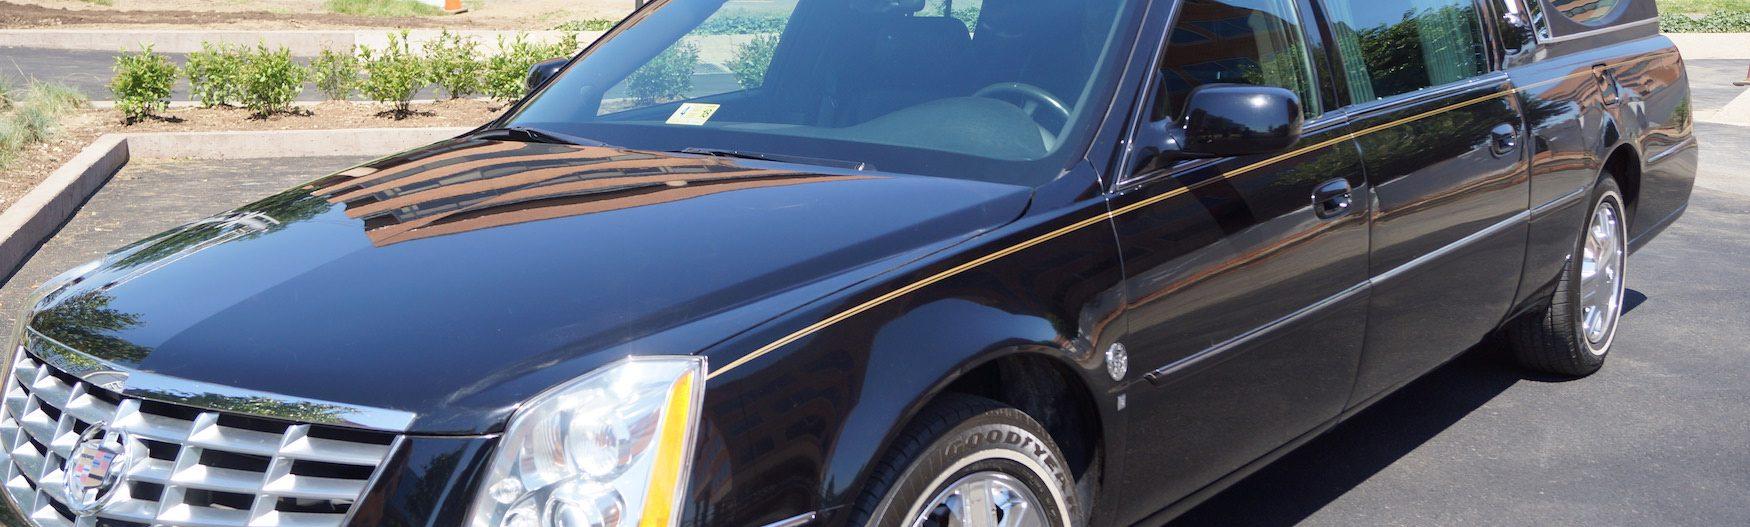 2006 Renaissance Cadillac Hearse